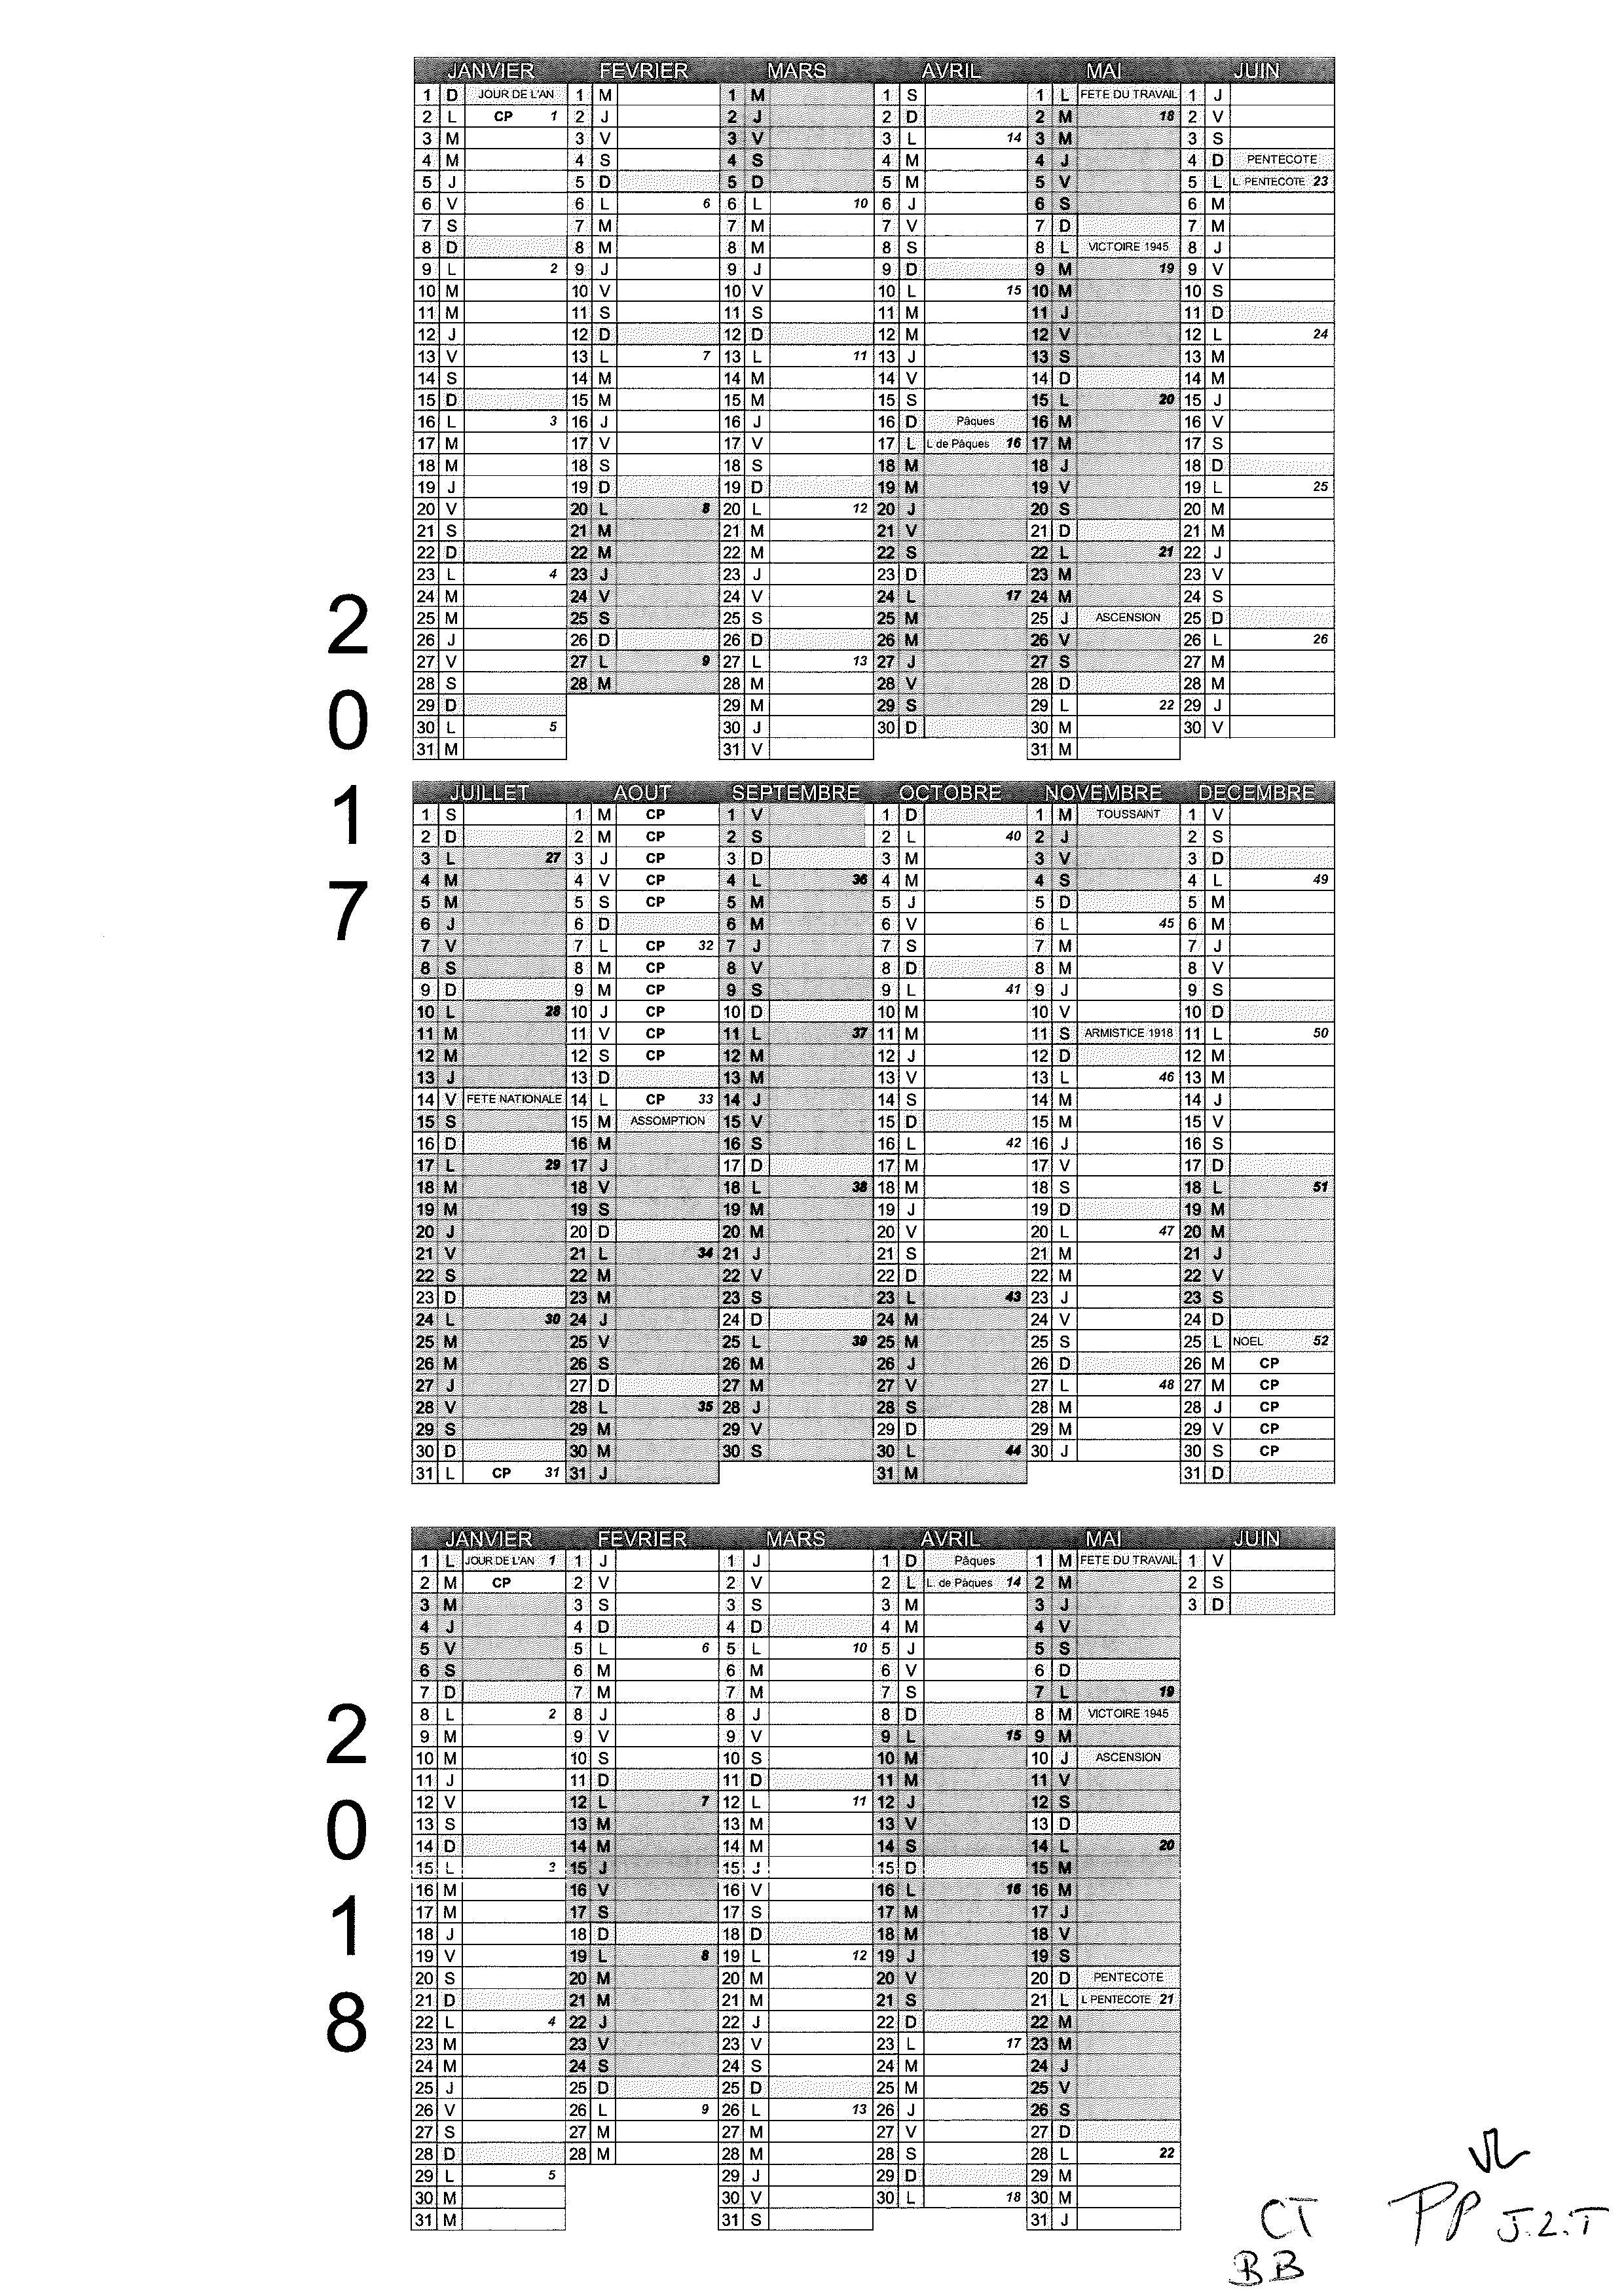 Accord Temps de Travail 2017_13